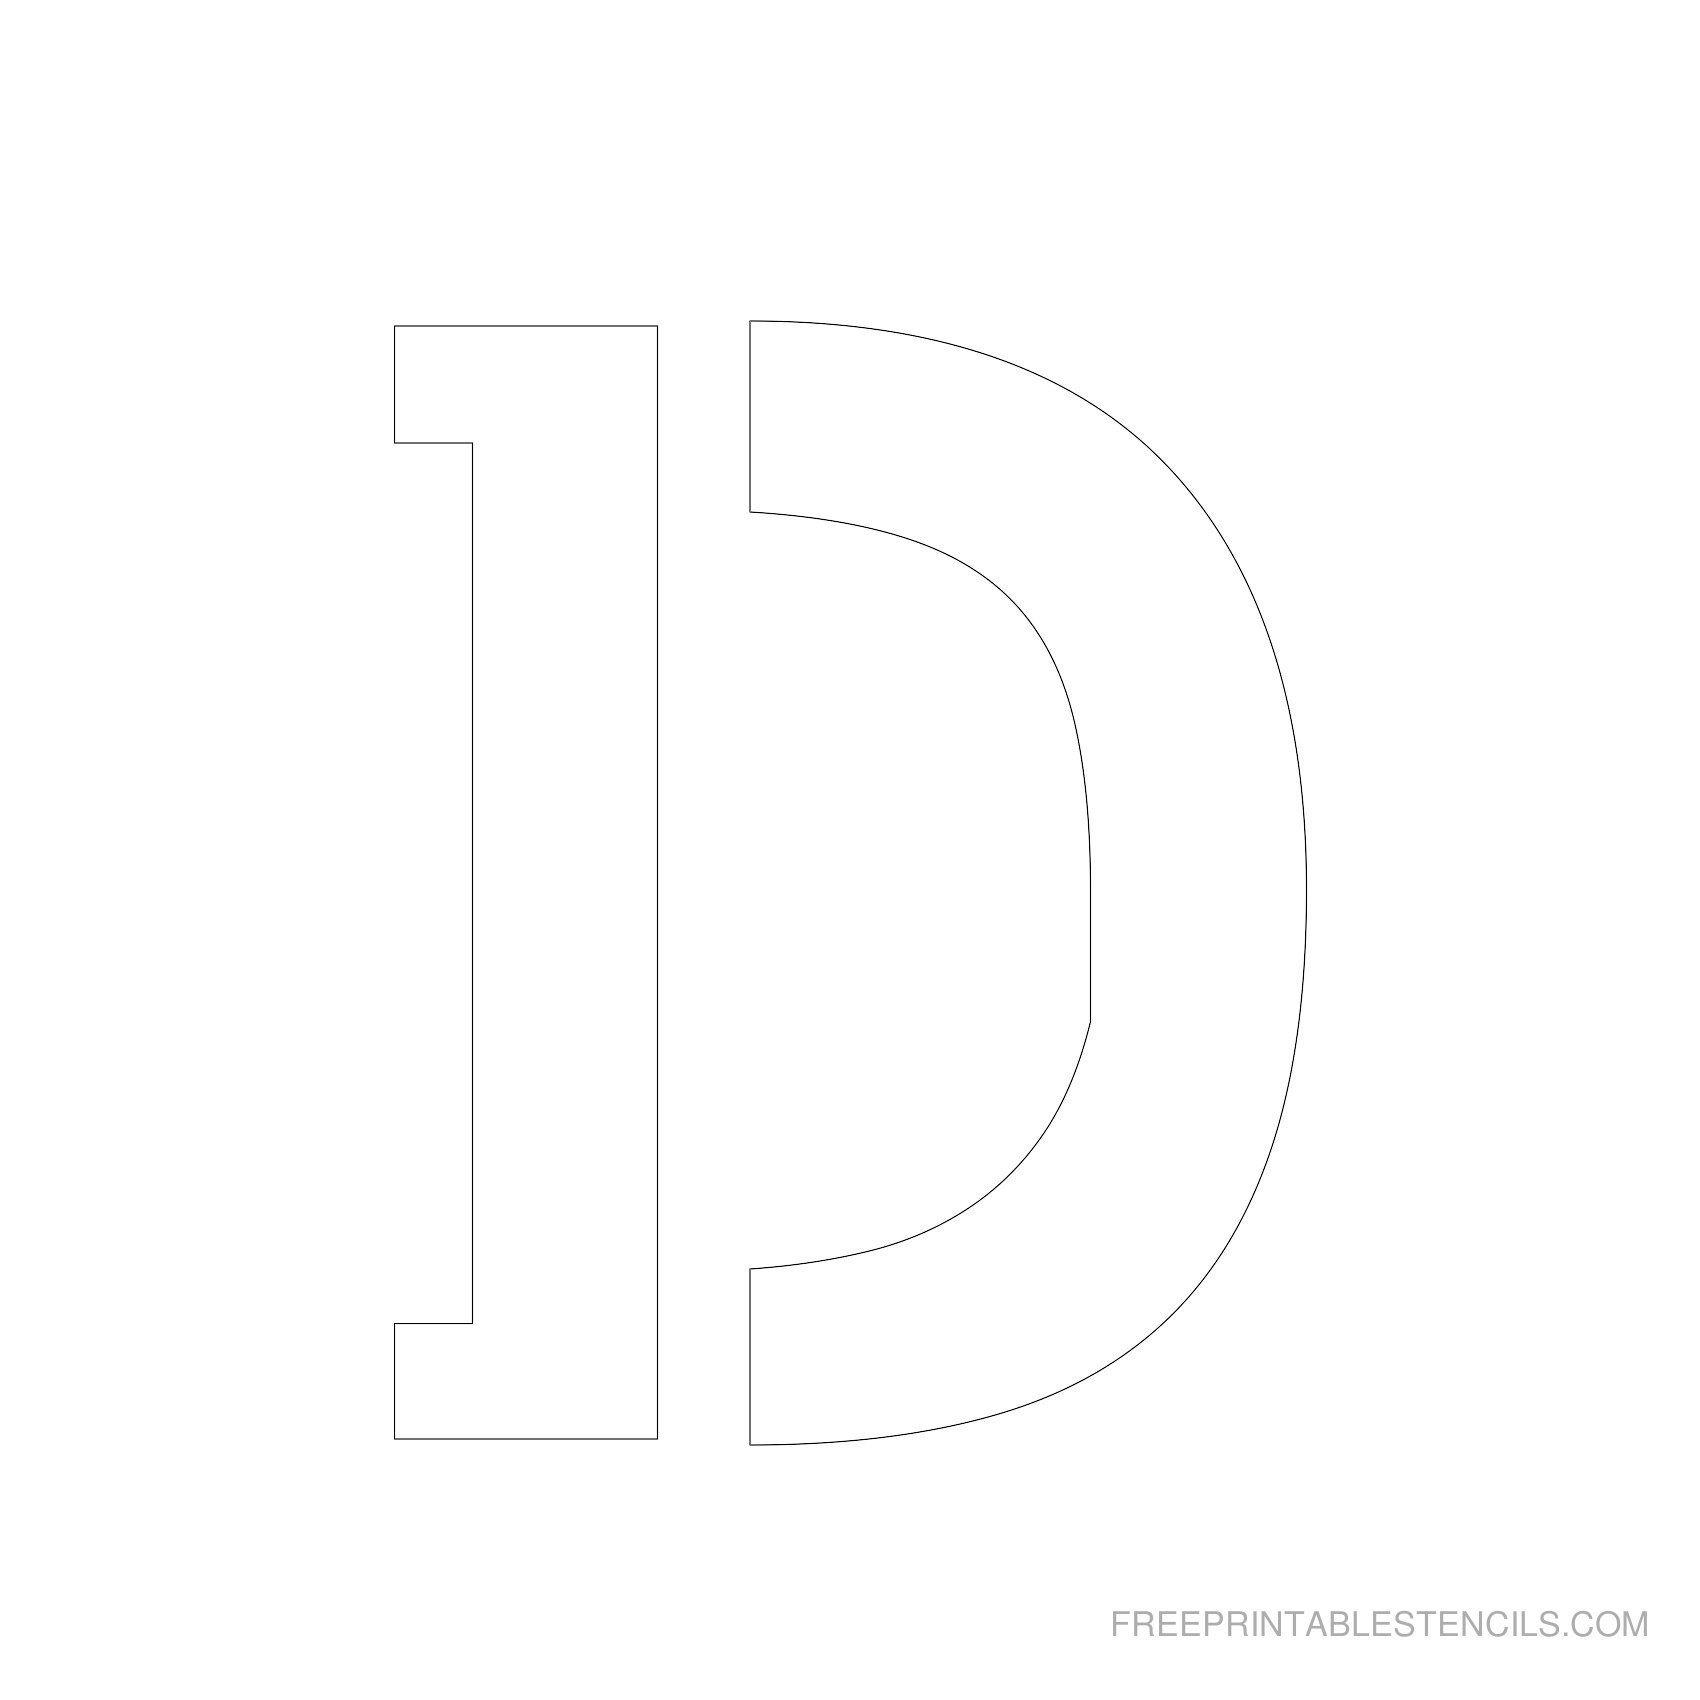 Printable 5 Inch Letter Stencils | Lettering | Letter Stencils To - Free Printable 8 Inch Letters